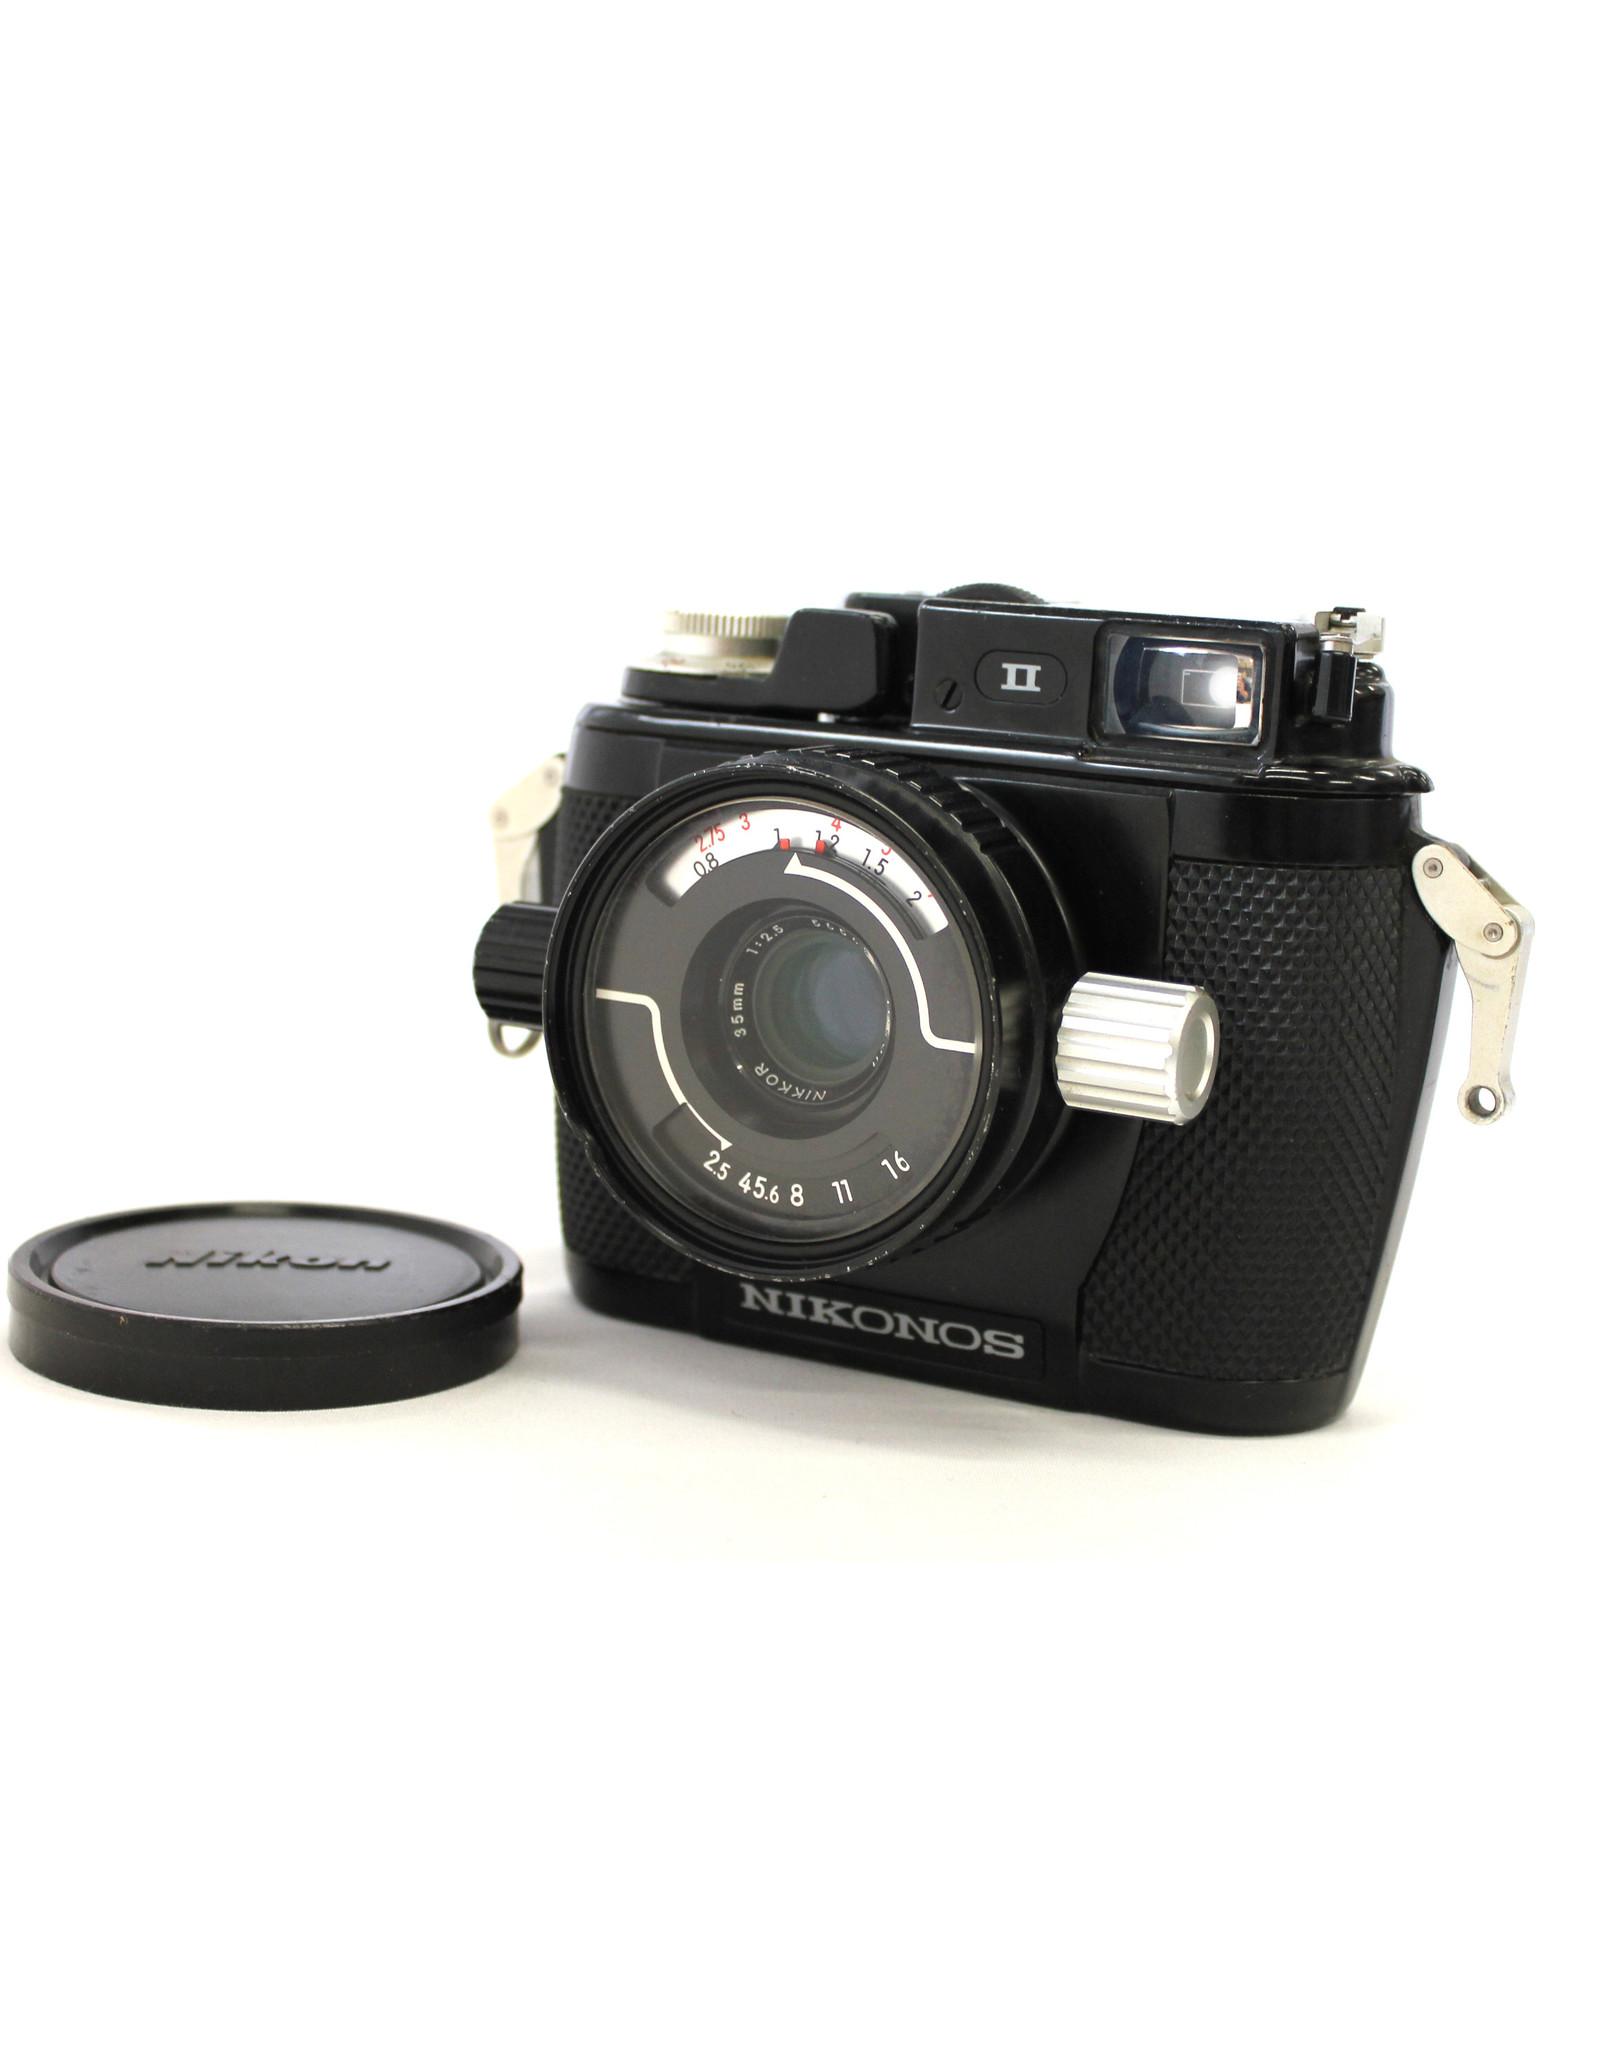 Nikon Nikon Nikonos II Underwater Camera w/35mm f2.8